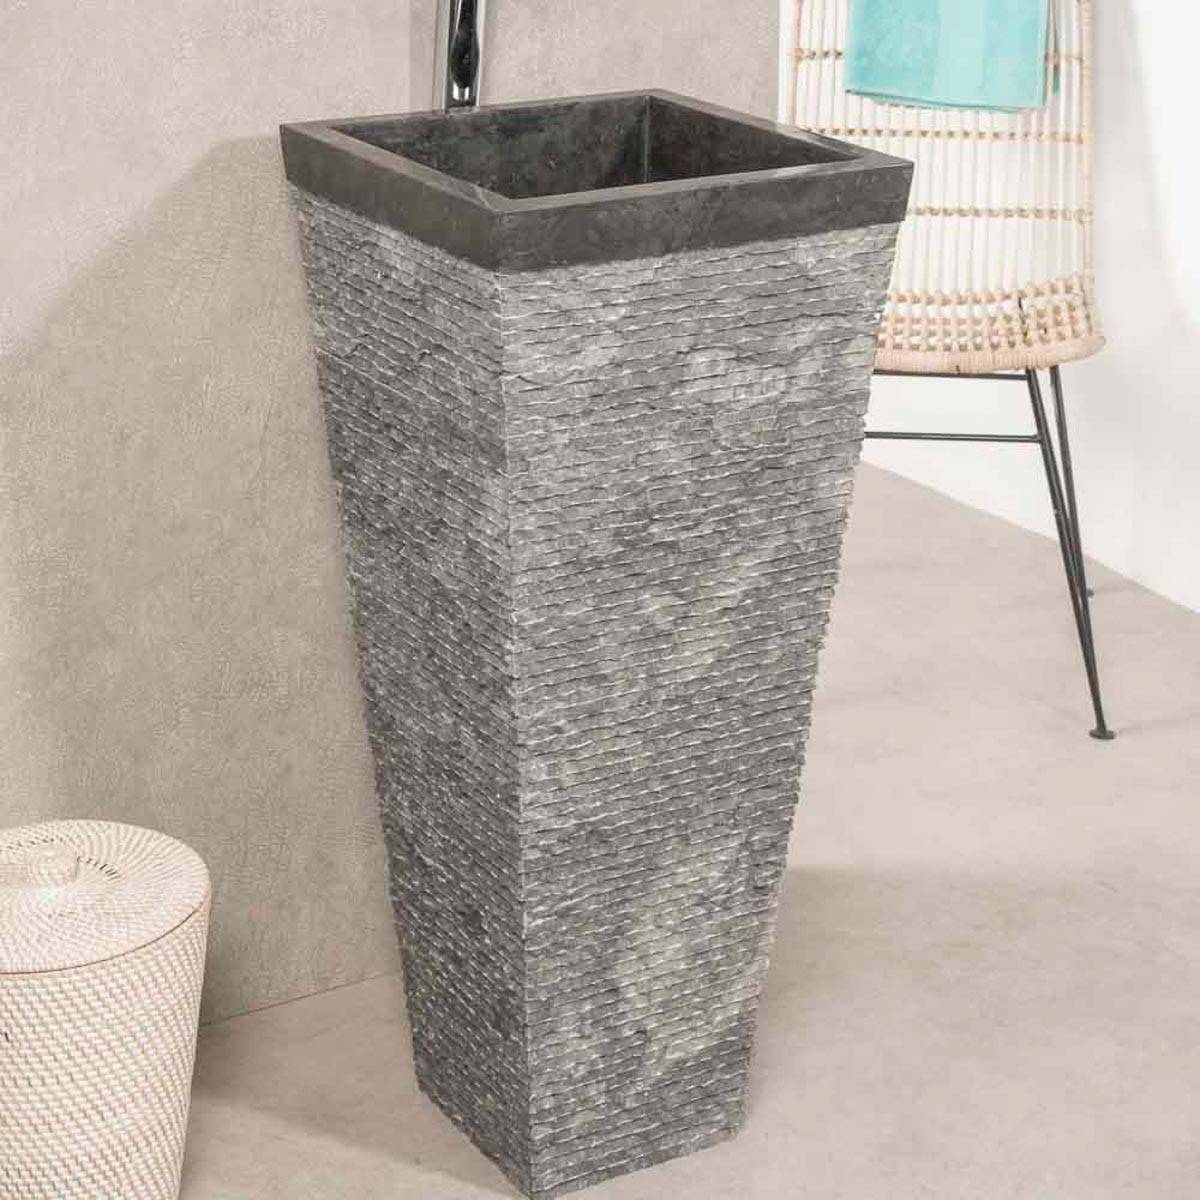 Wanda Collection Vasque salle de bain sur pied en pierre pyramide havana noir